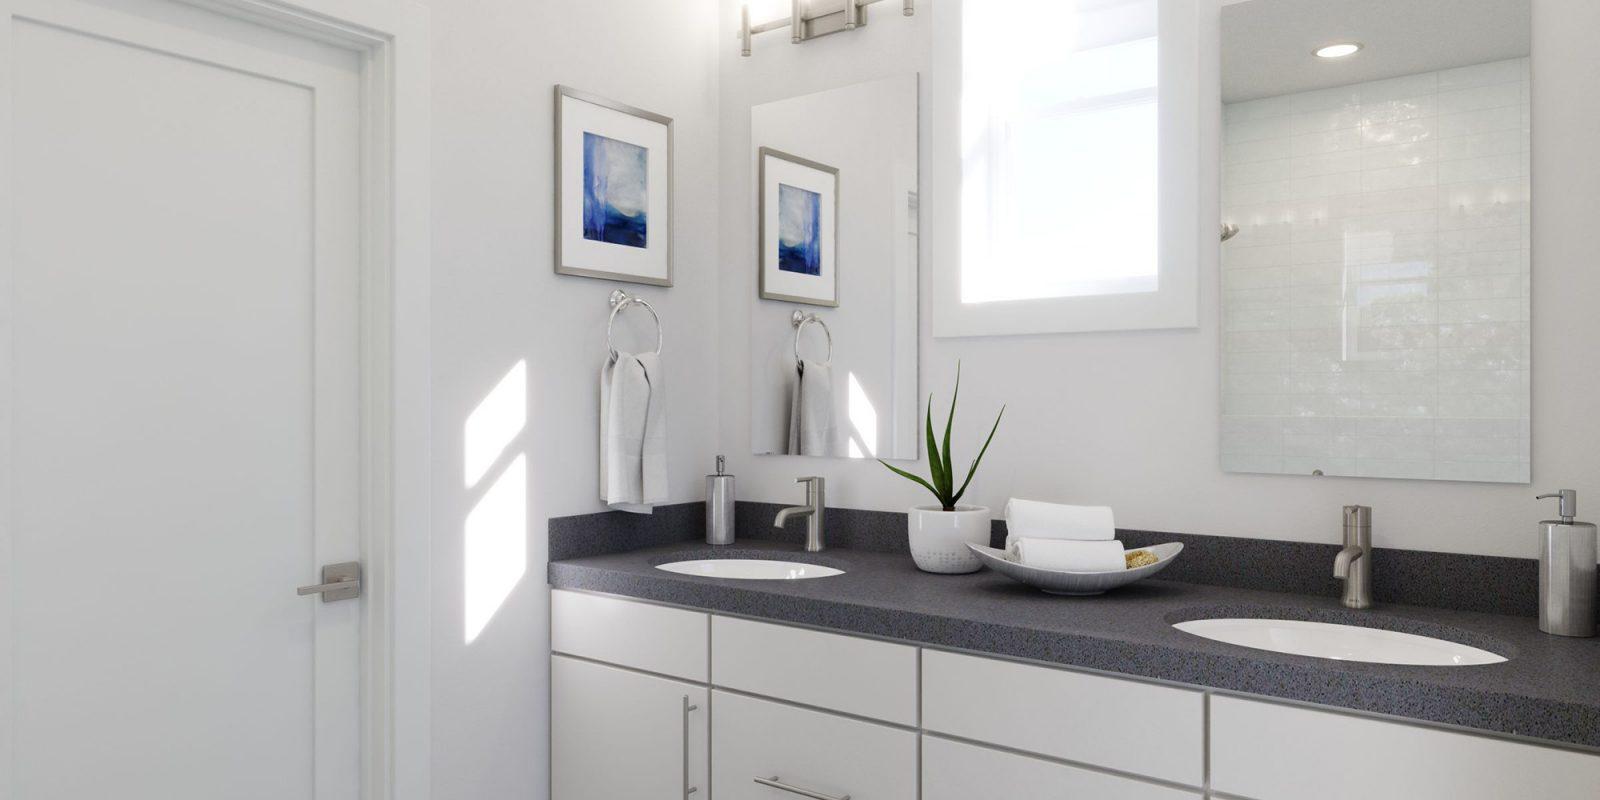 Baseline DoMore Rows: Oasis - Master Bathroom